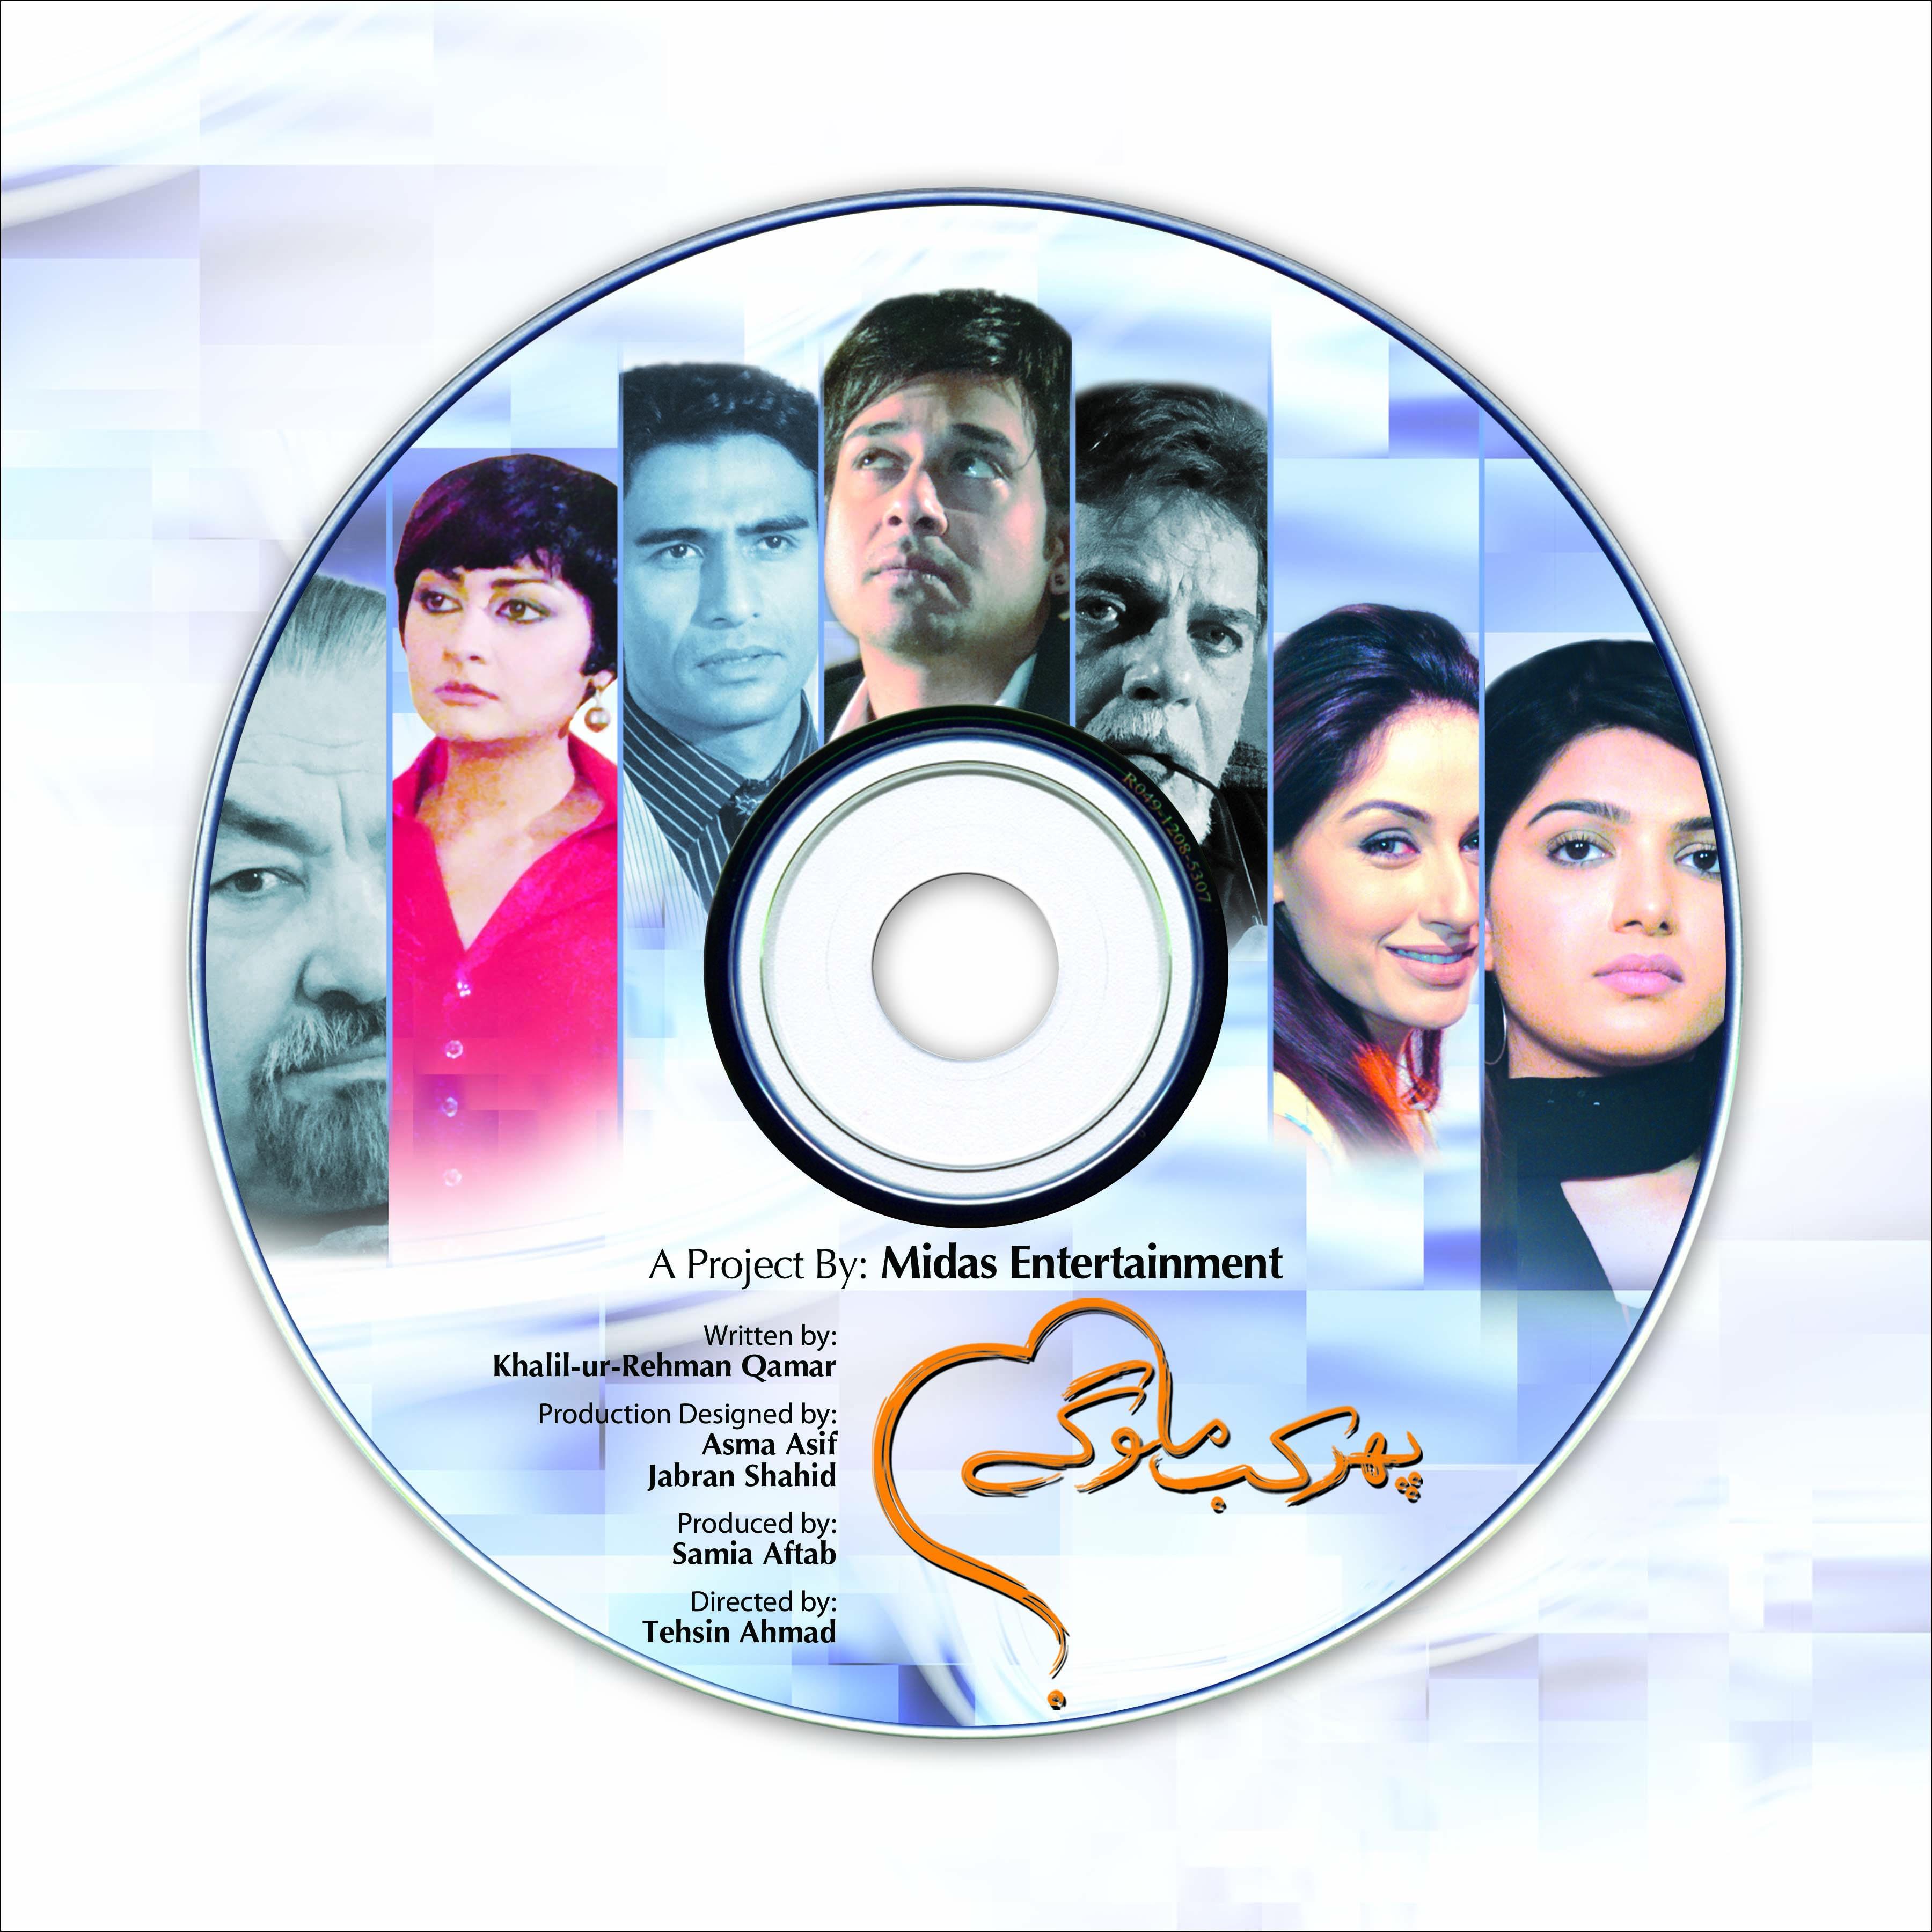 11-Midas-Entt-CD-Frame-Phir-Kab-Milo-Gey-12-inch-x-12-inch